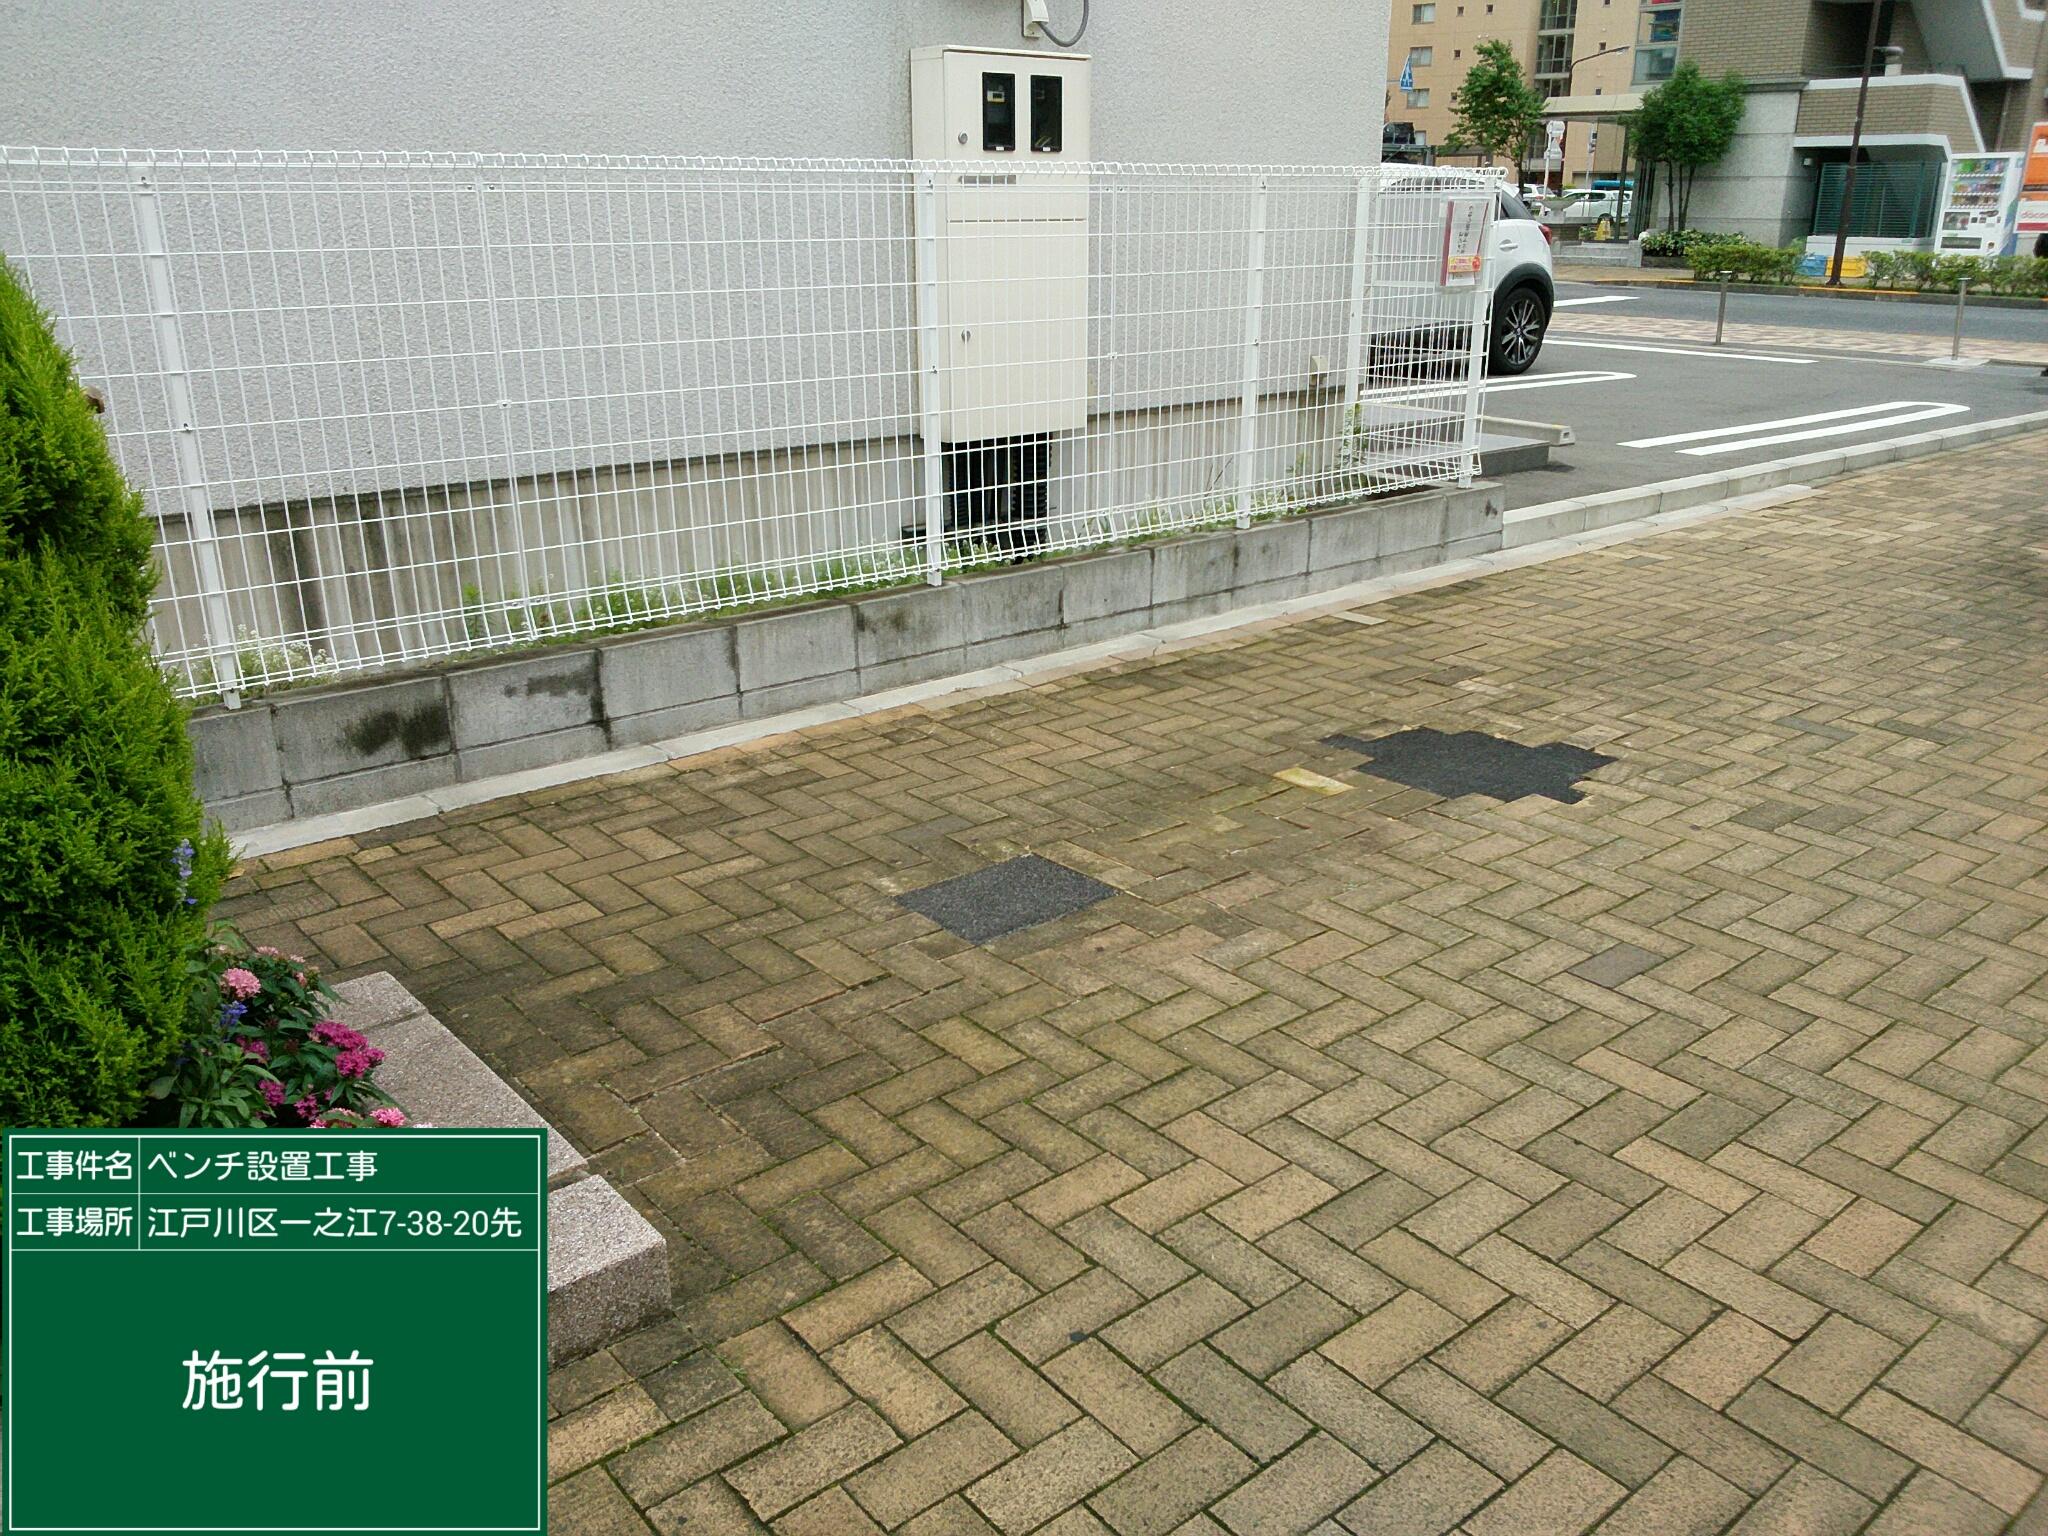 江戸川区一之江 ベンチ設置工事 事故保険対応